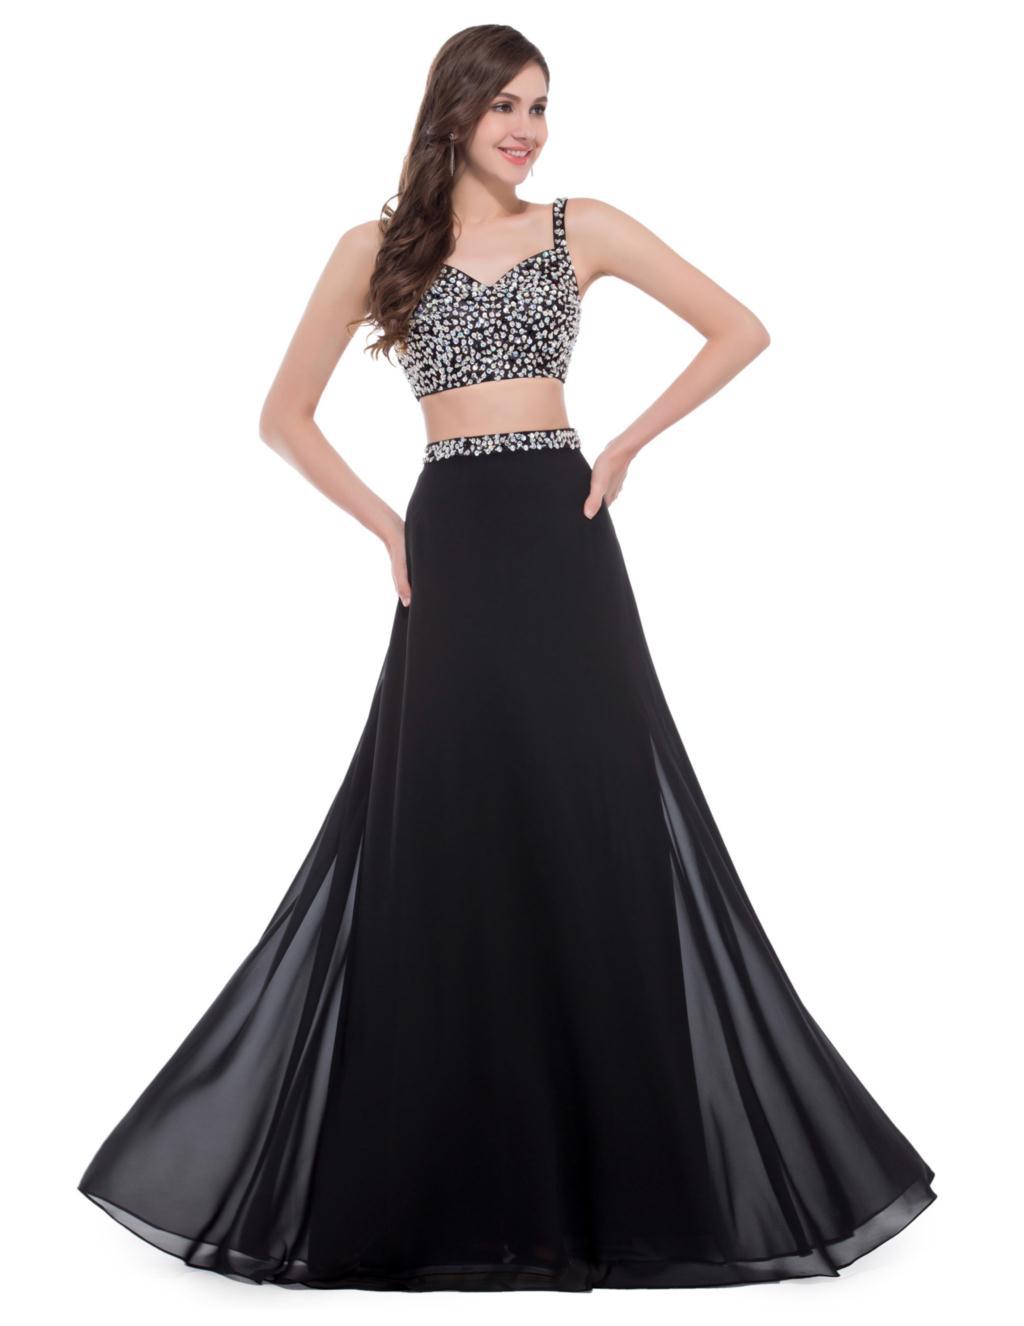 Black dress design - Aeproduct Getsubject